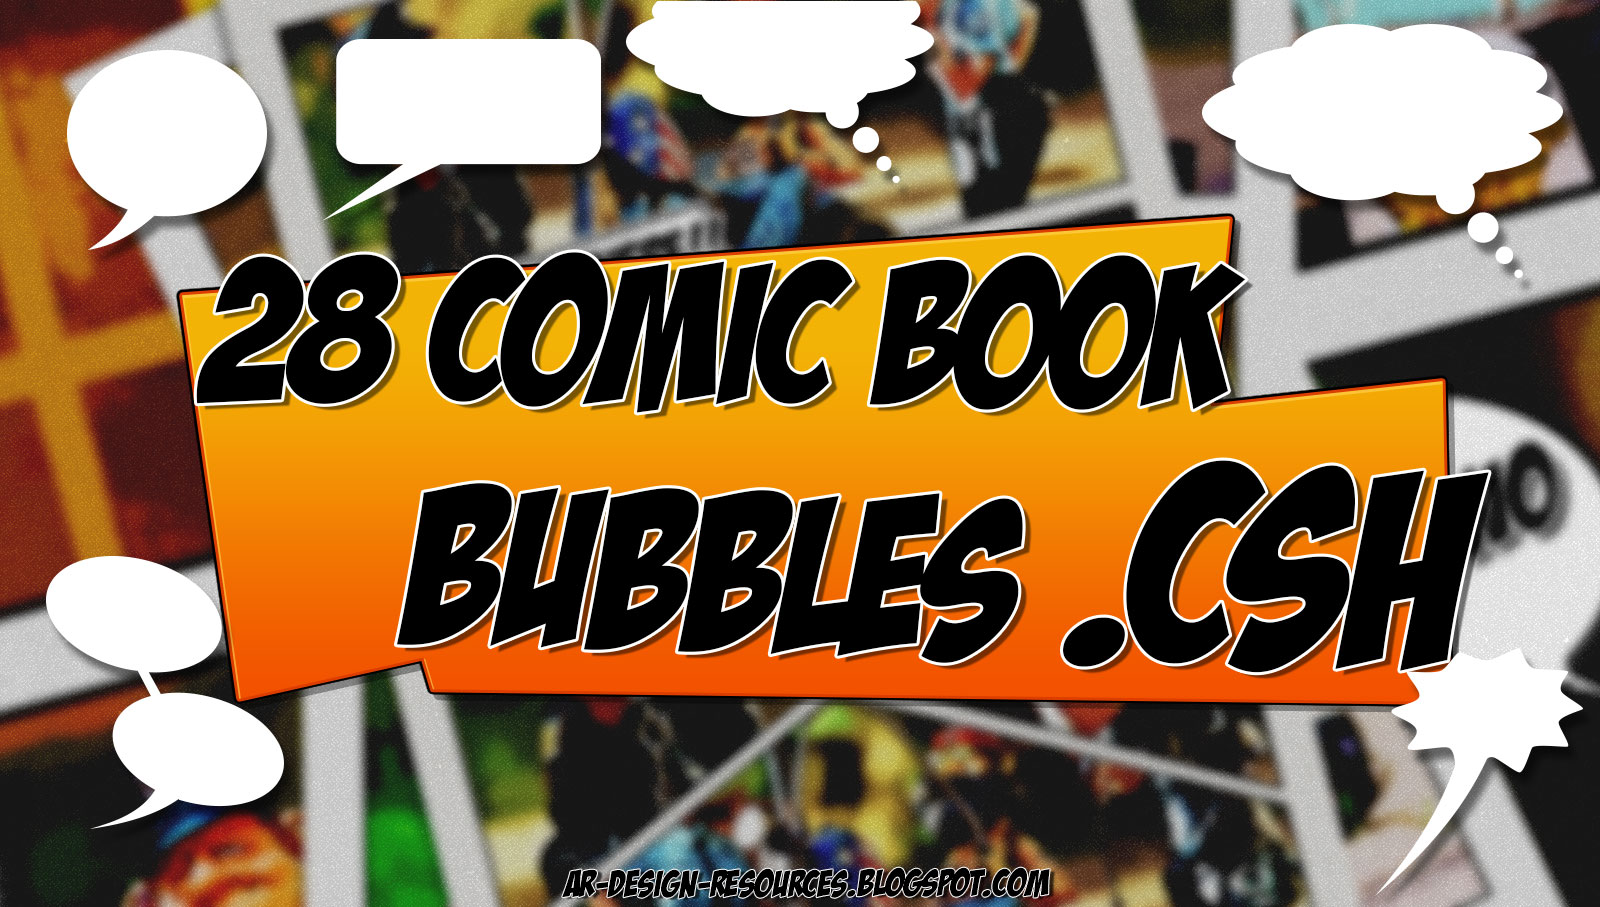 ADR 28 Comic Book Bubbles Thumbnail